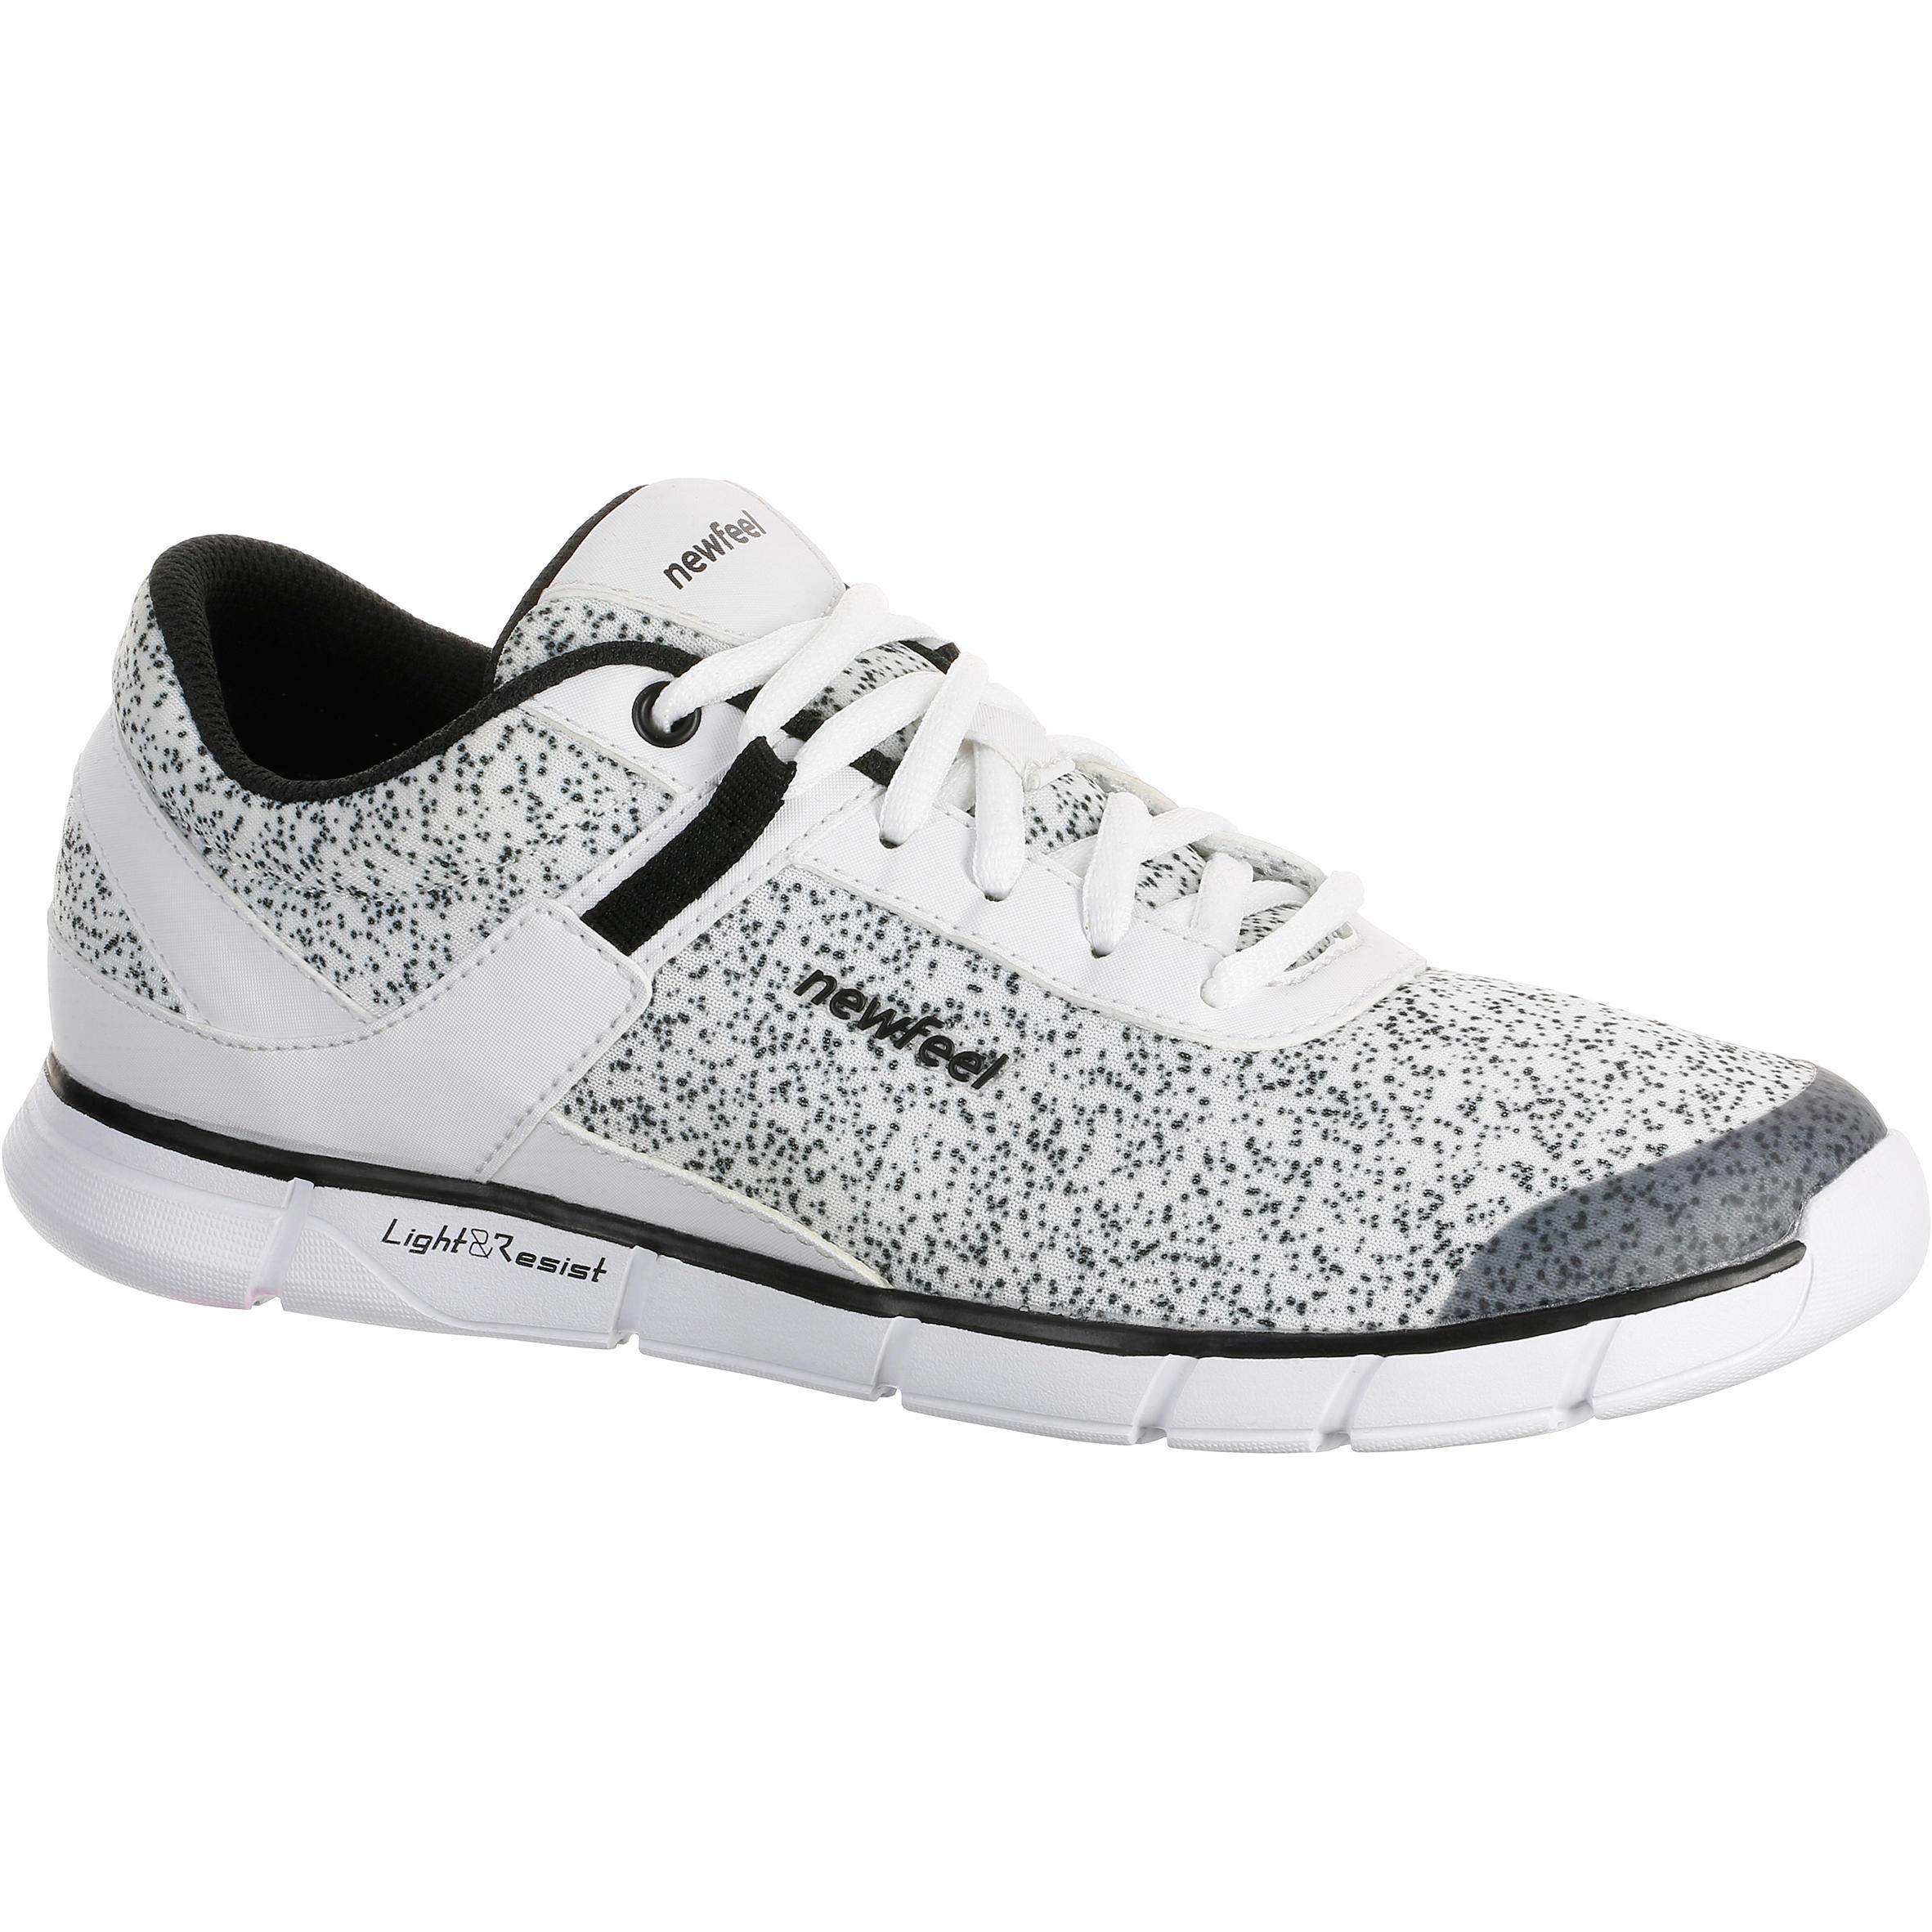 Newfeel Damessneakers Soft 540